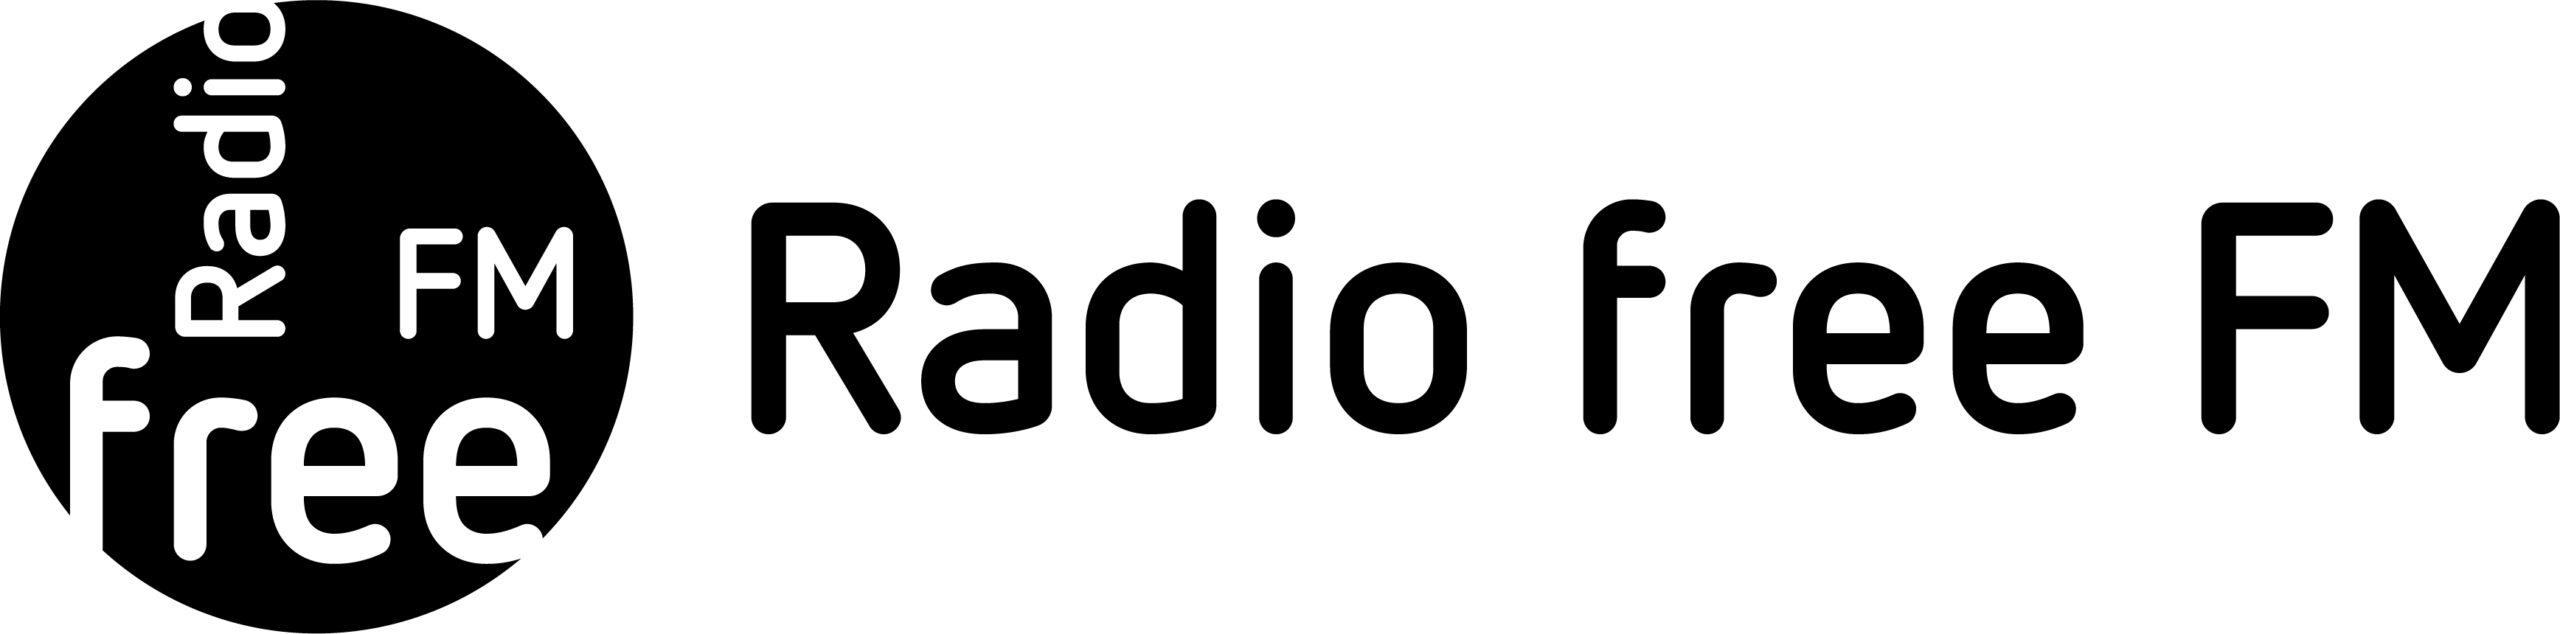 Radio free FM